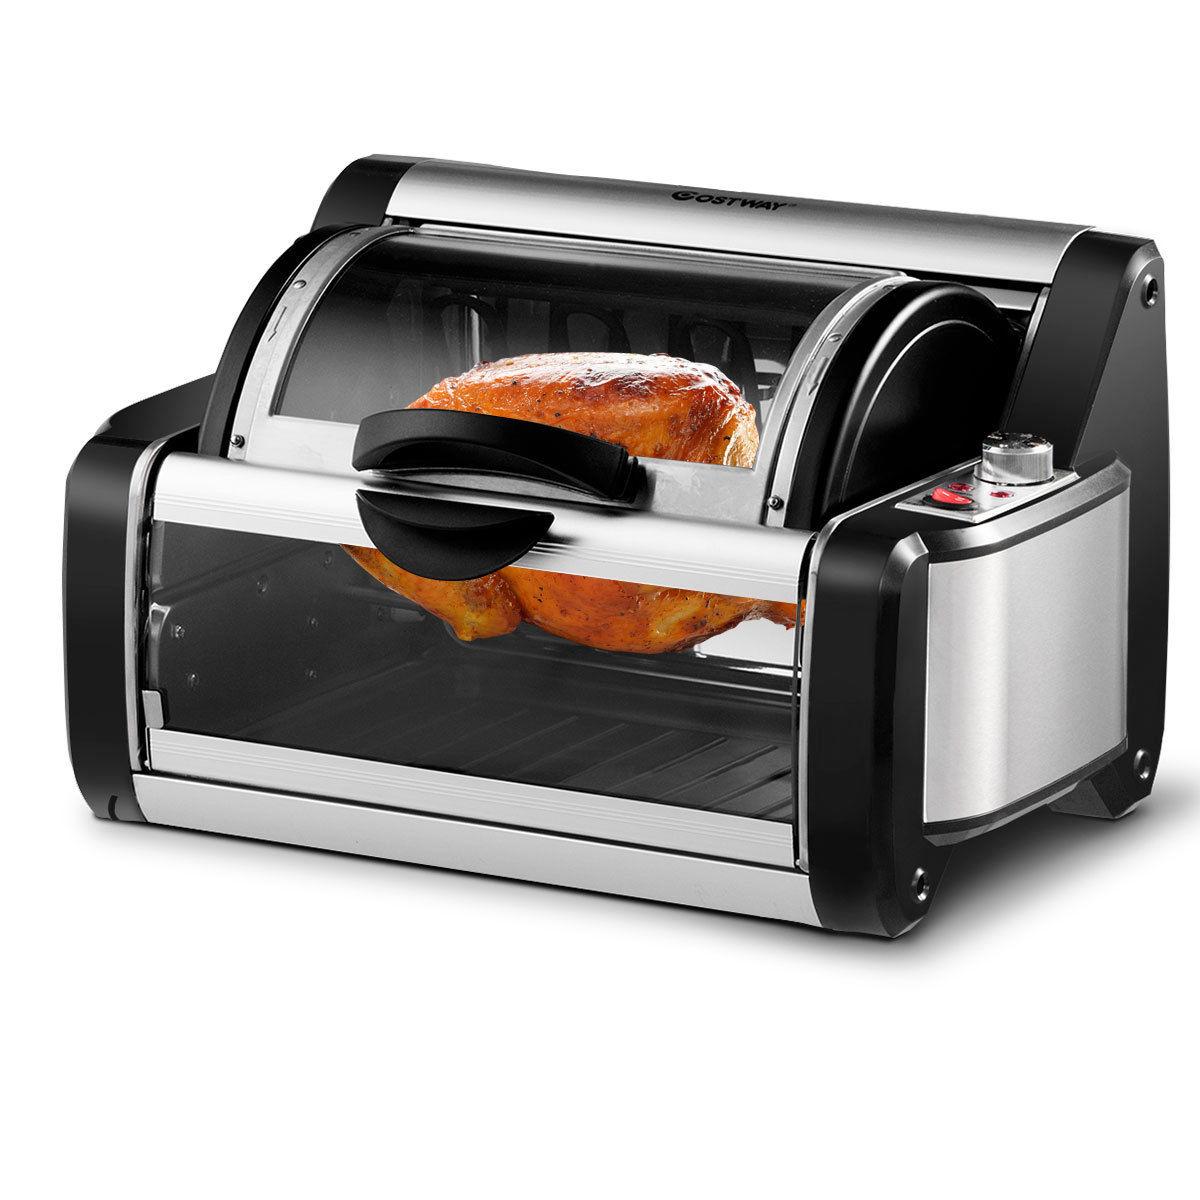 Costway Horizontal Rotating Rotisserie Oven Grill Shawarma Machine Kebob Skewer Roaster